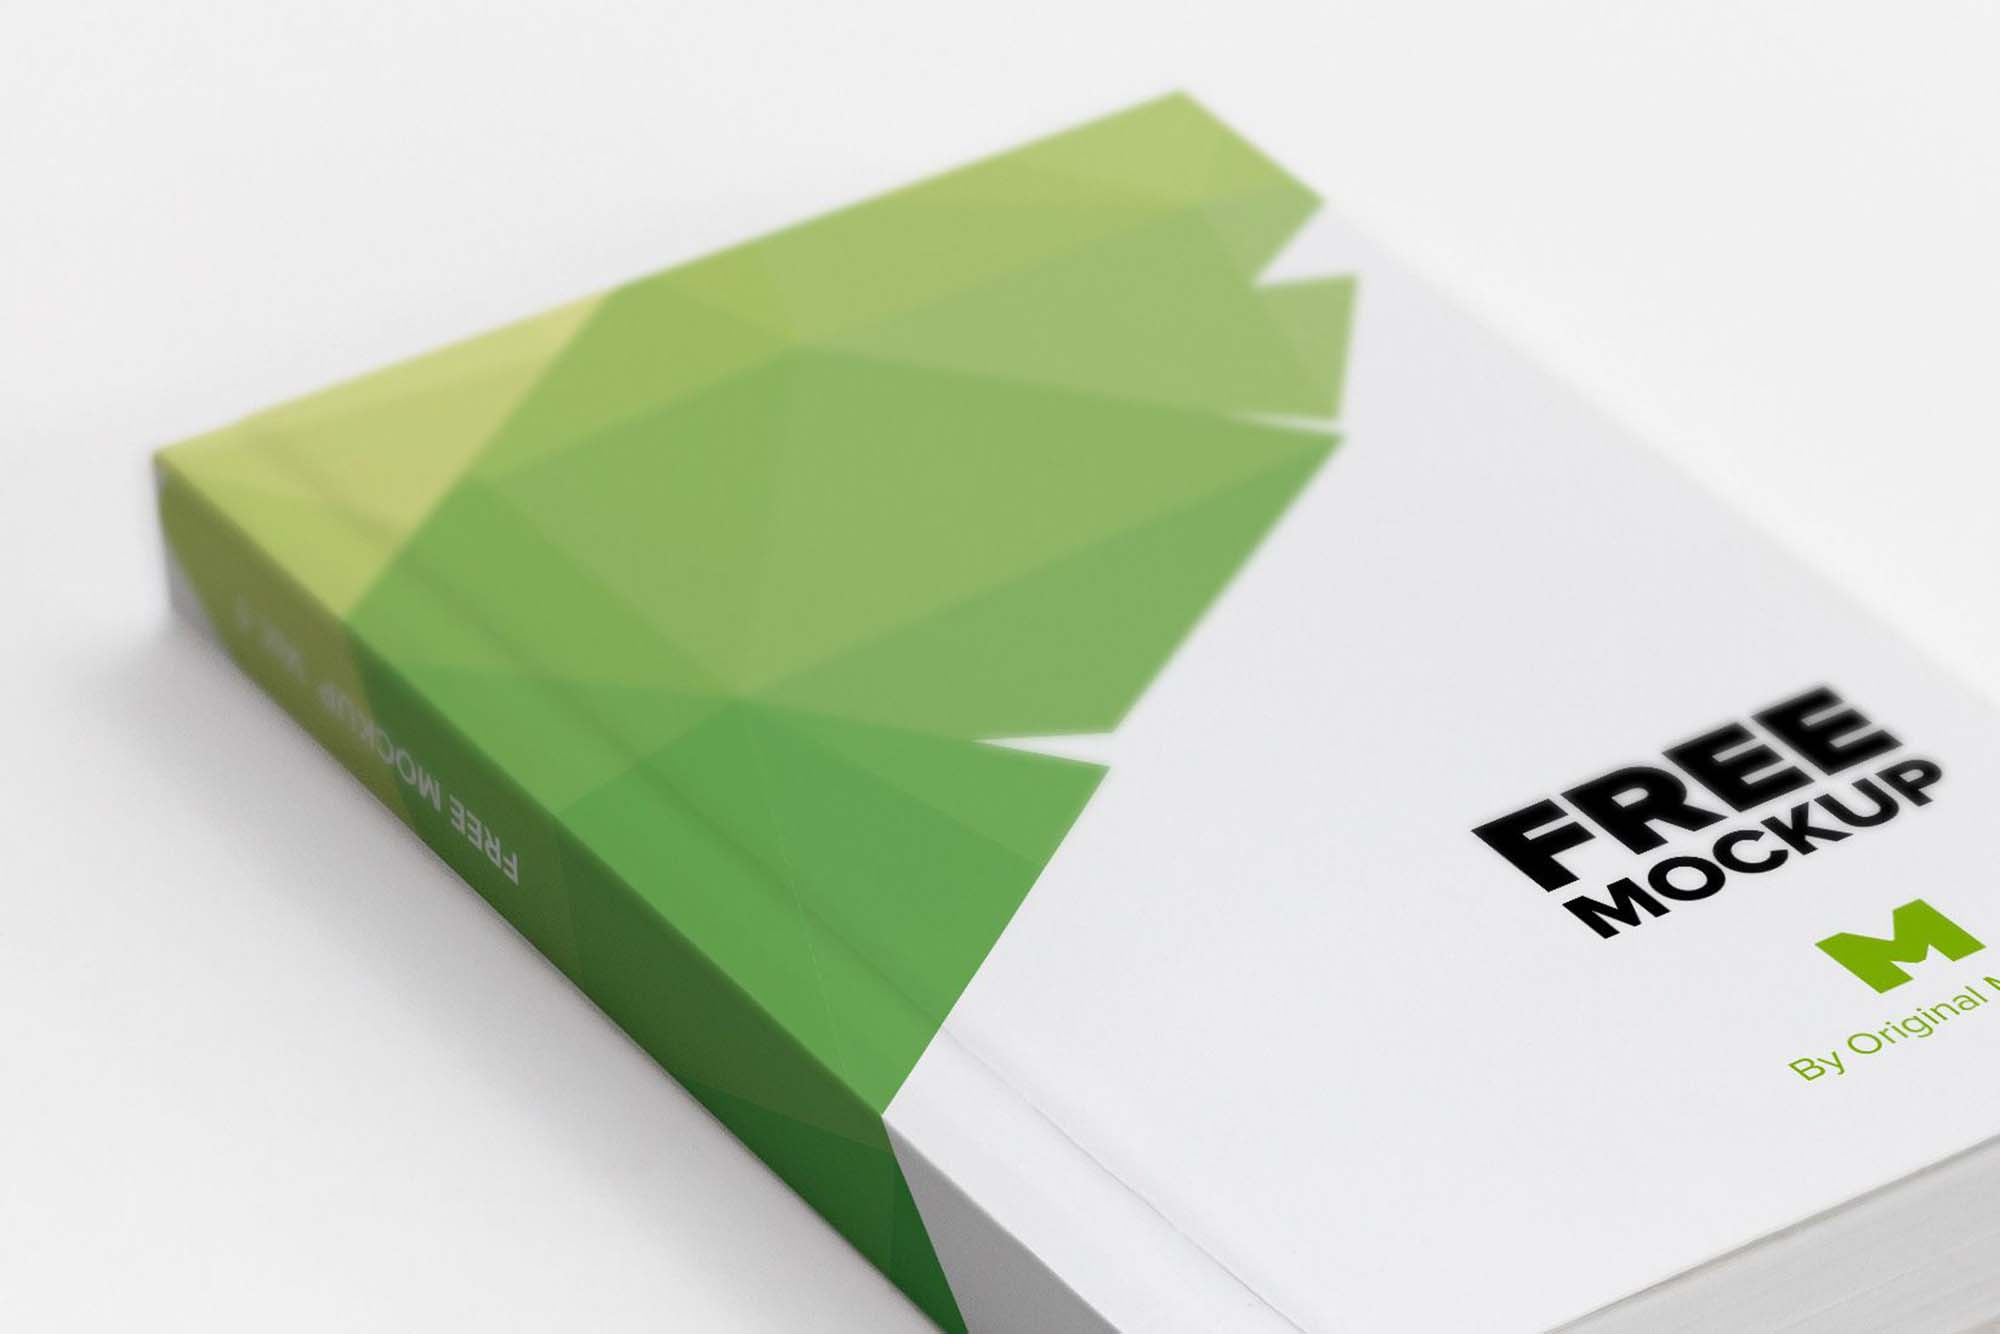 Softcover Trade Book Mockup